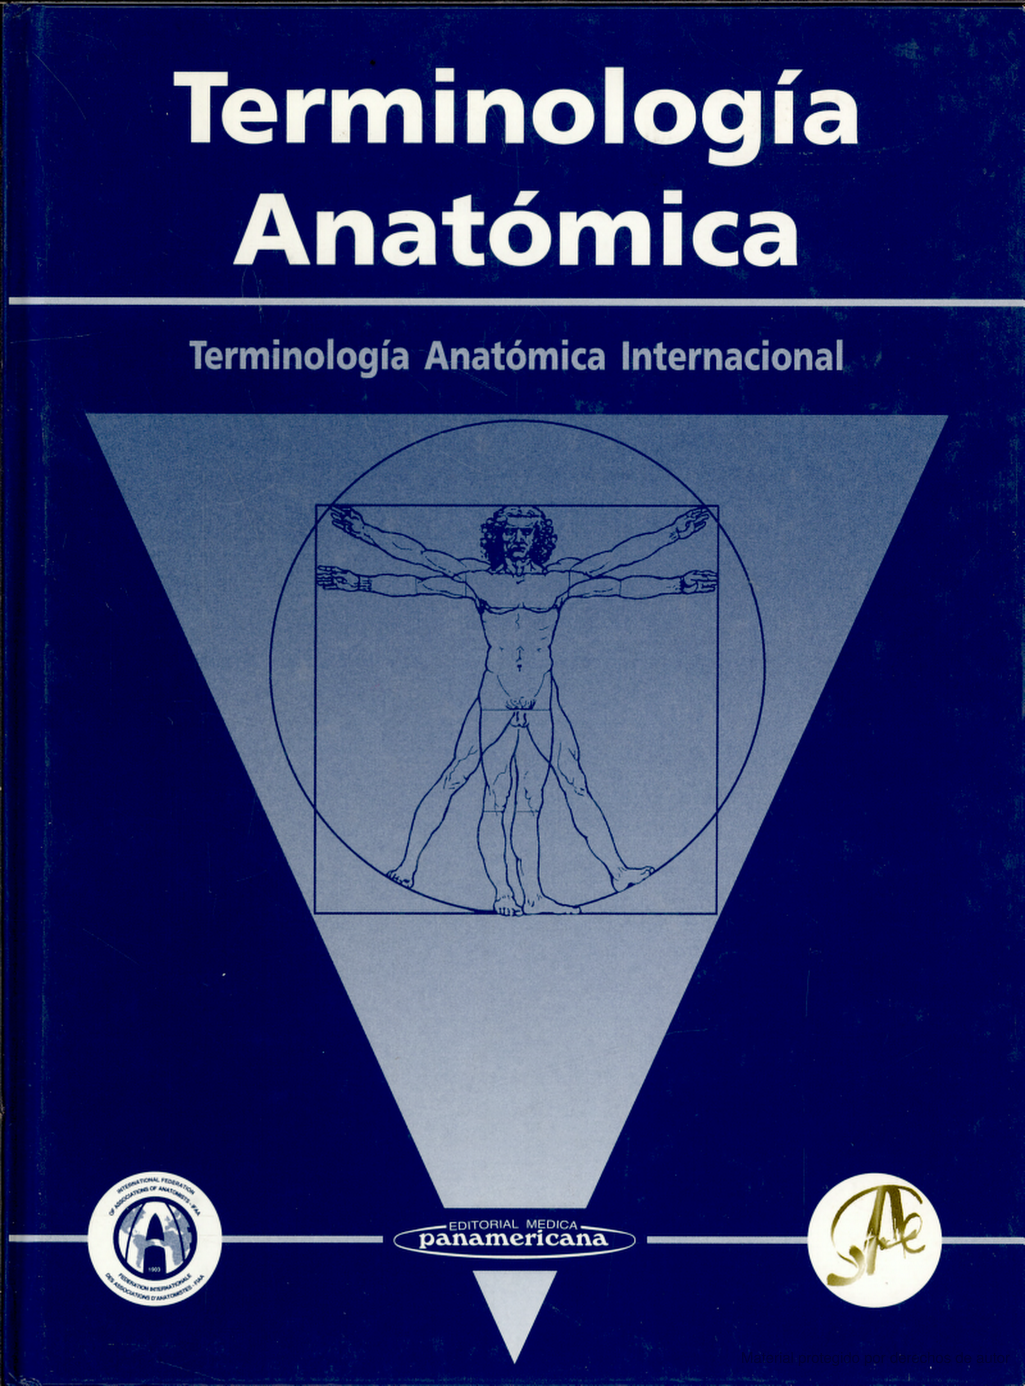 Terminologia Anatomica Internacional